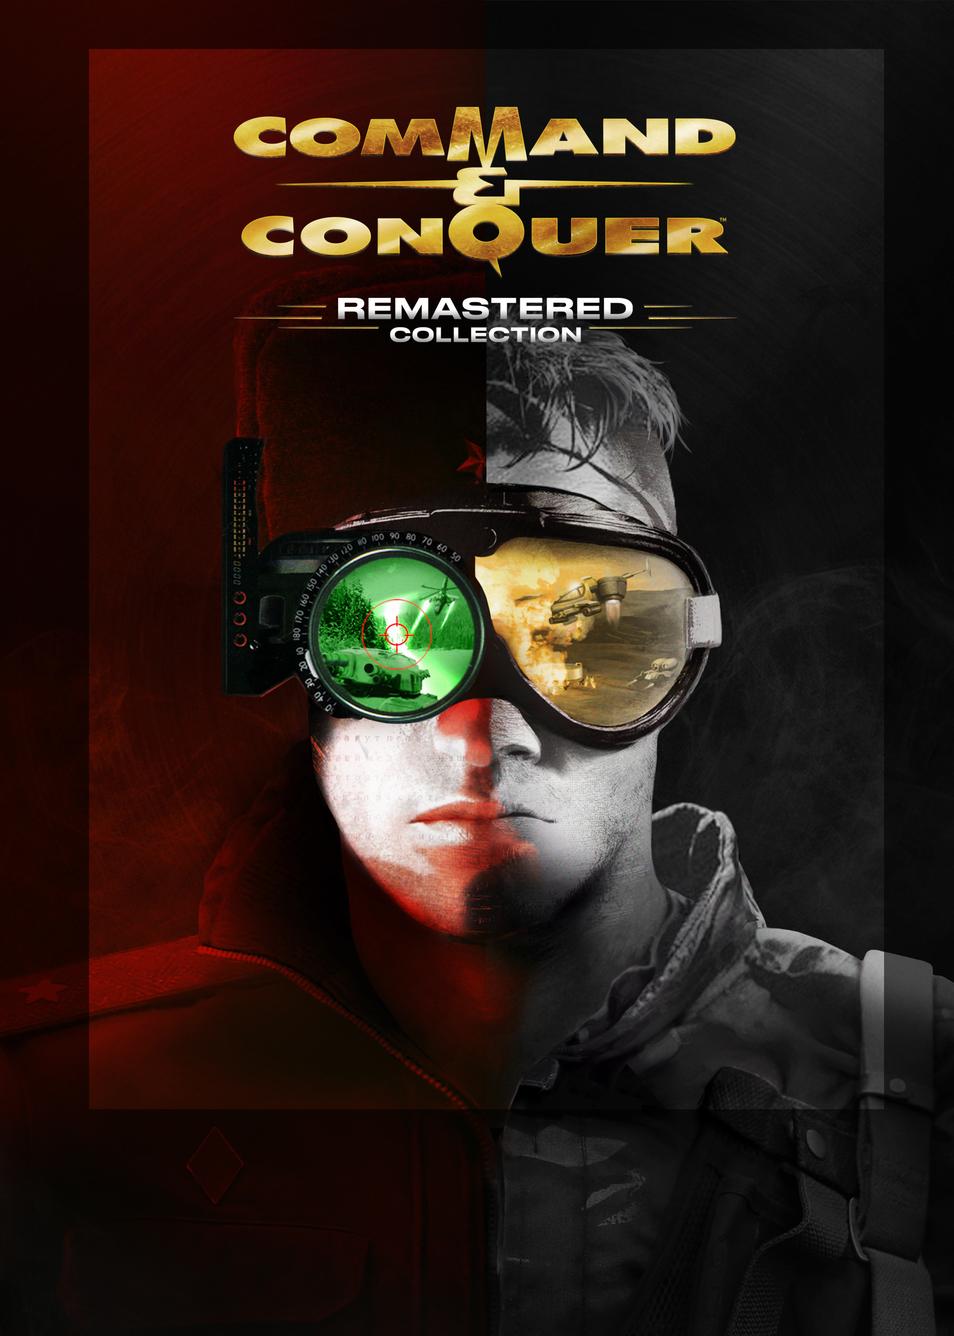 Command & Conquer Remastered Collection(ANZ+ASIA+NCSA) - Origin